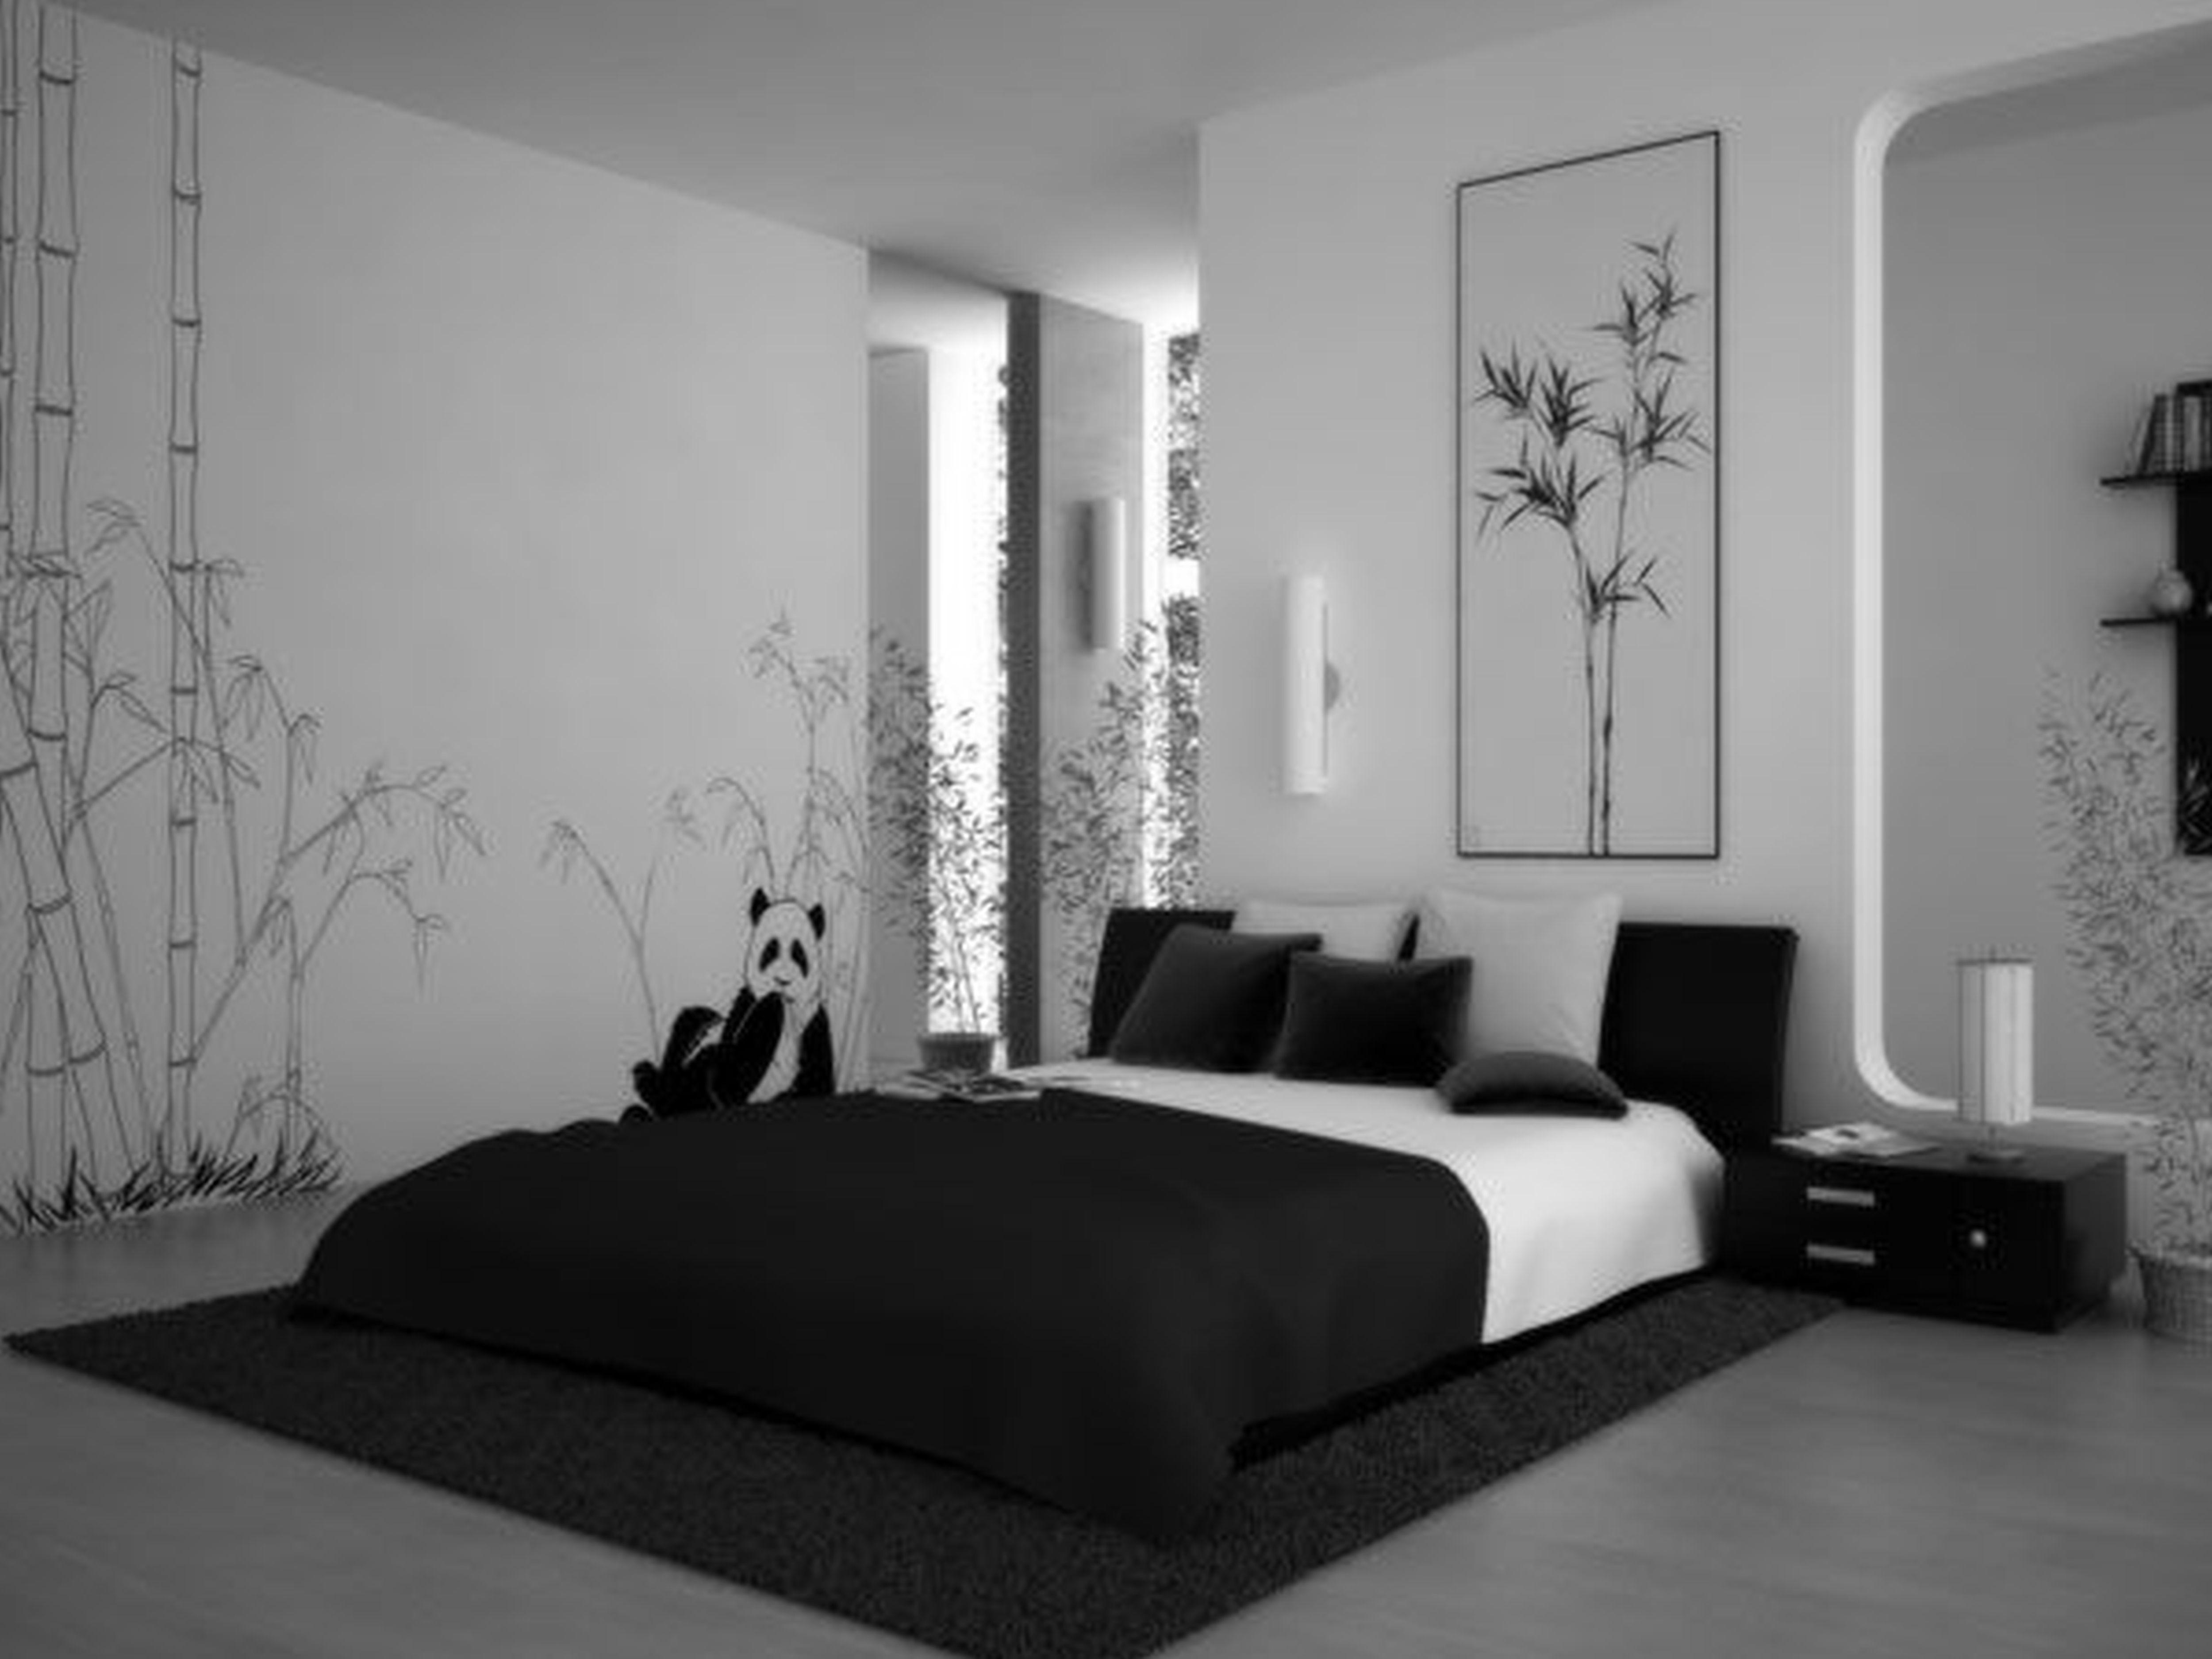 Black And White Bedroom Designs For Teenage Girls Hawk Haven - Black and white bedroom designs for teenage girls